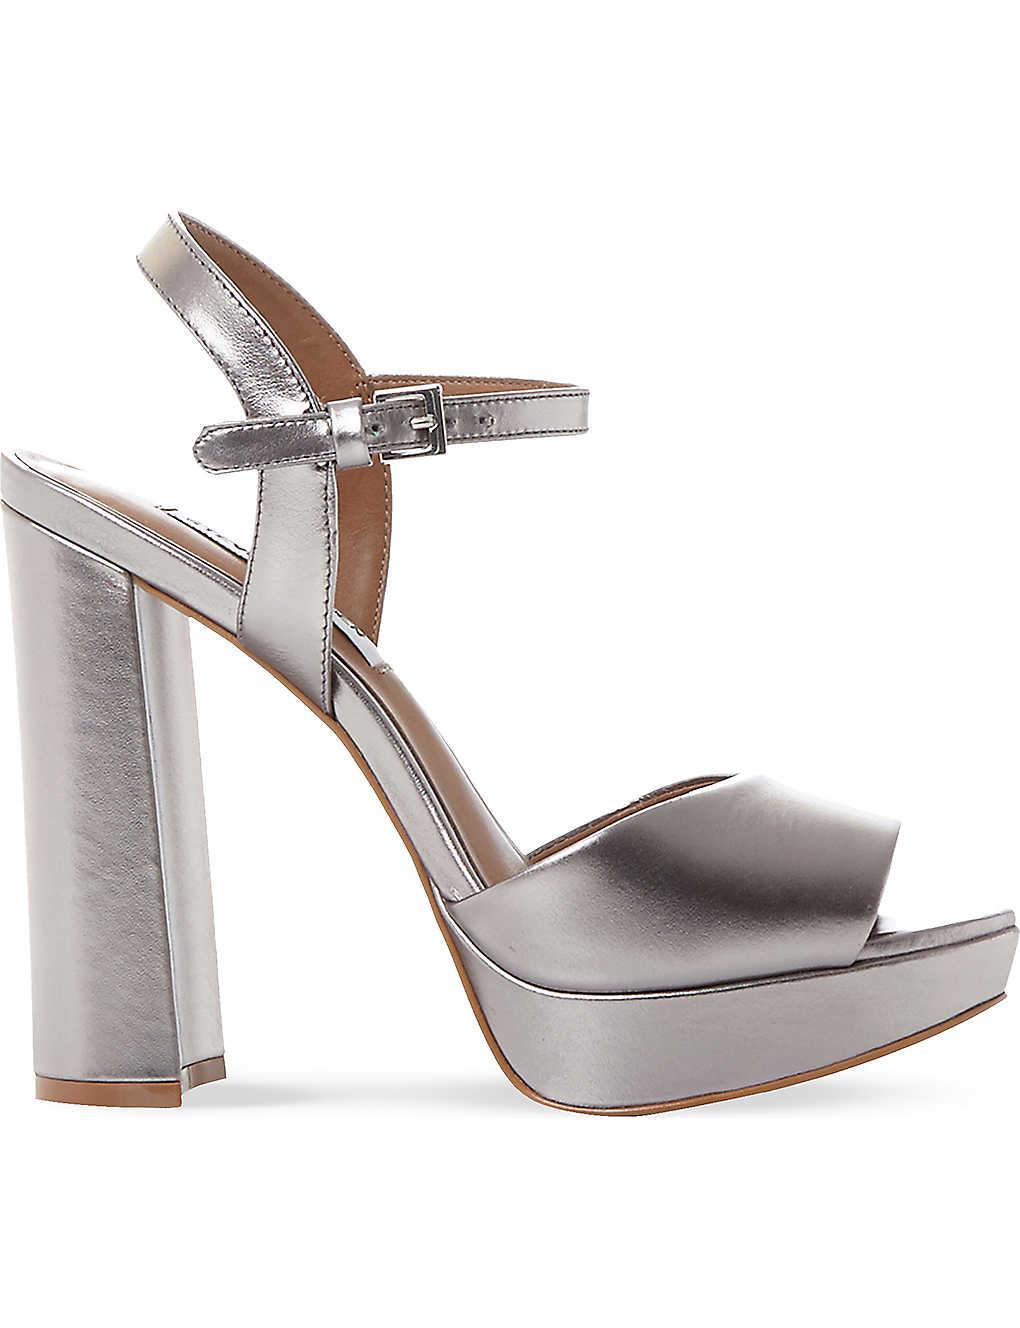 bc9bef21790 STEVE MADDEN - Kierra SM leather platform sandals | Selfridges.com